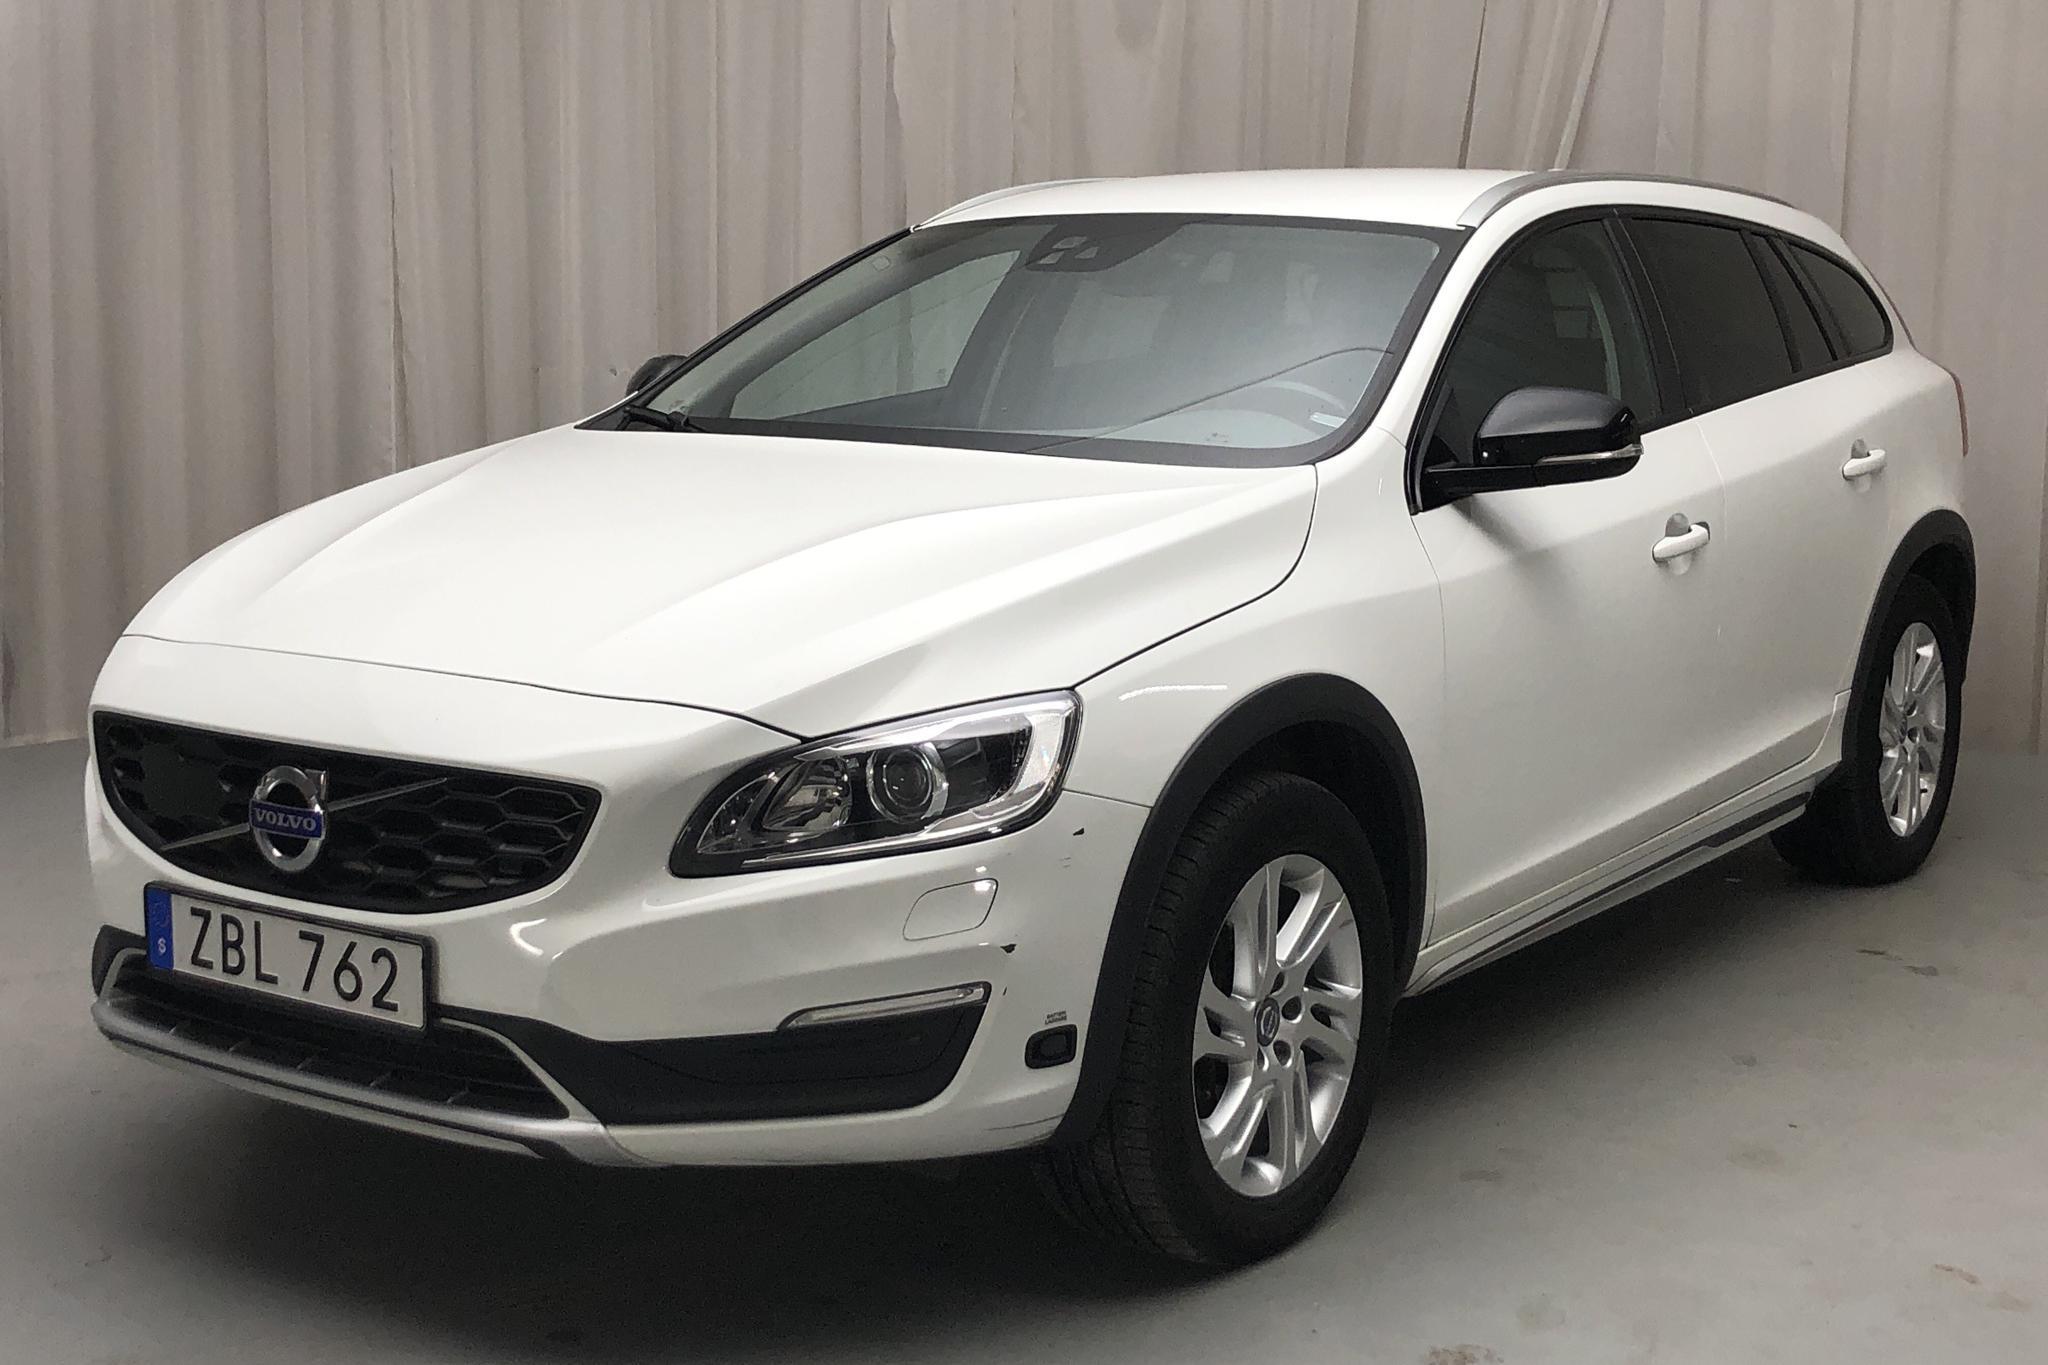 Volvo V60 D3 Cross Country (150hk) - 117 200 km - Automatic - white - 2018